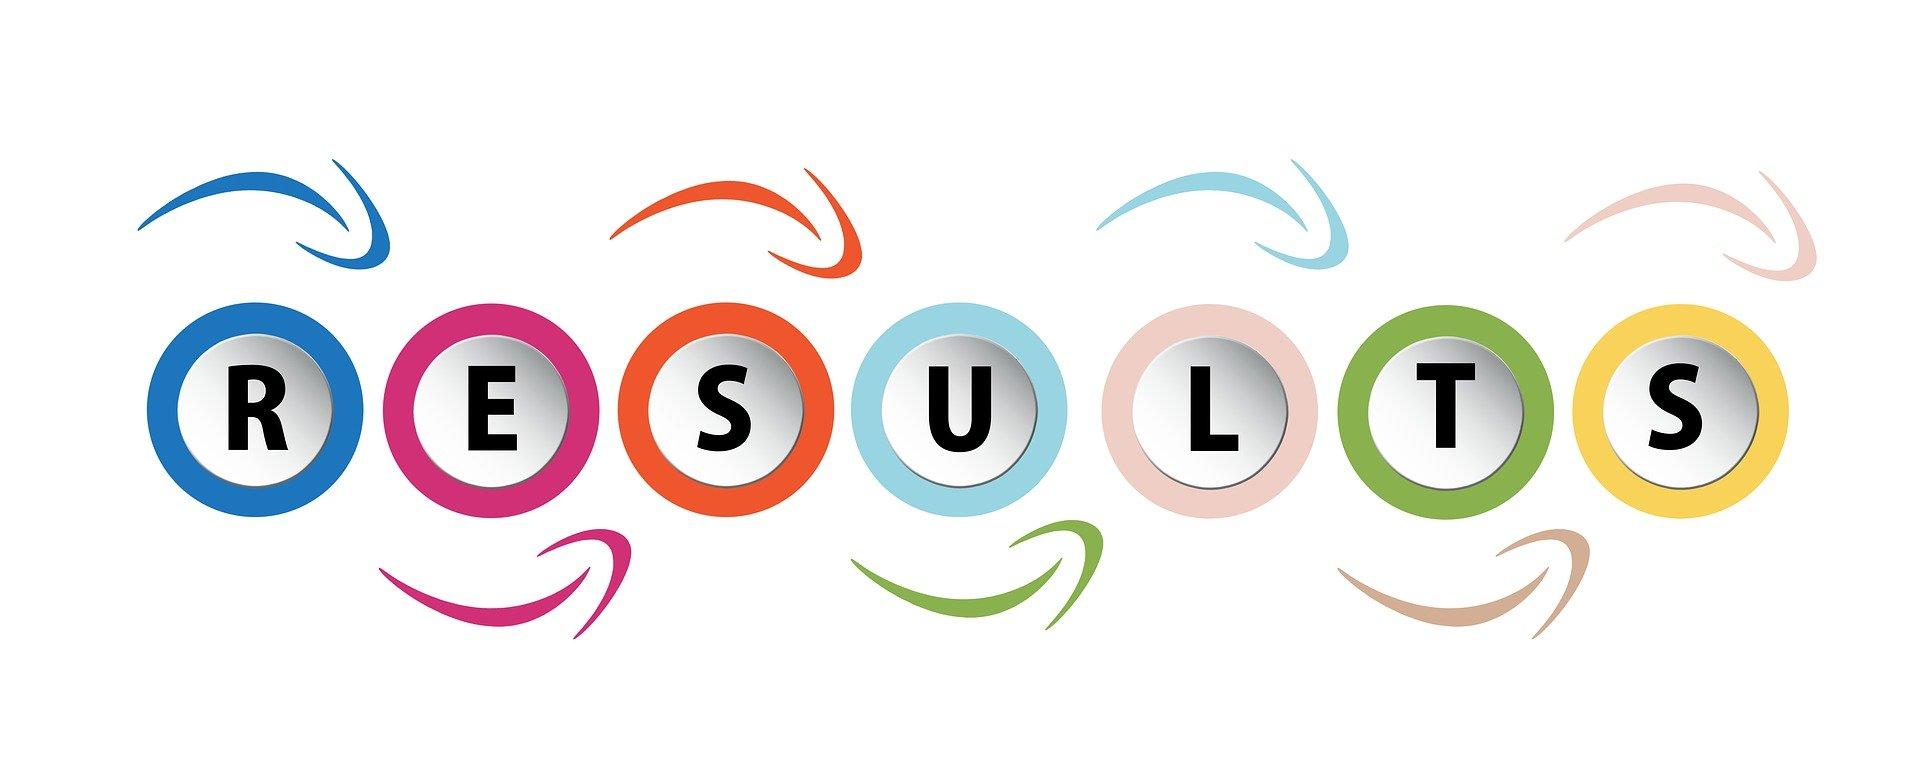 Resultat Ergebnis Entschuldigung Versagen - (c) Pixabay